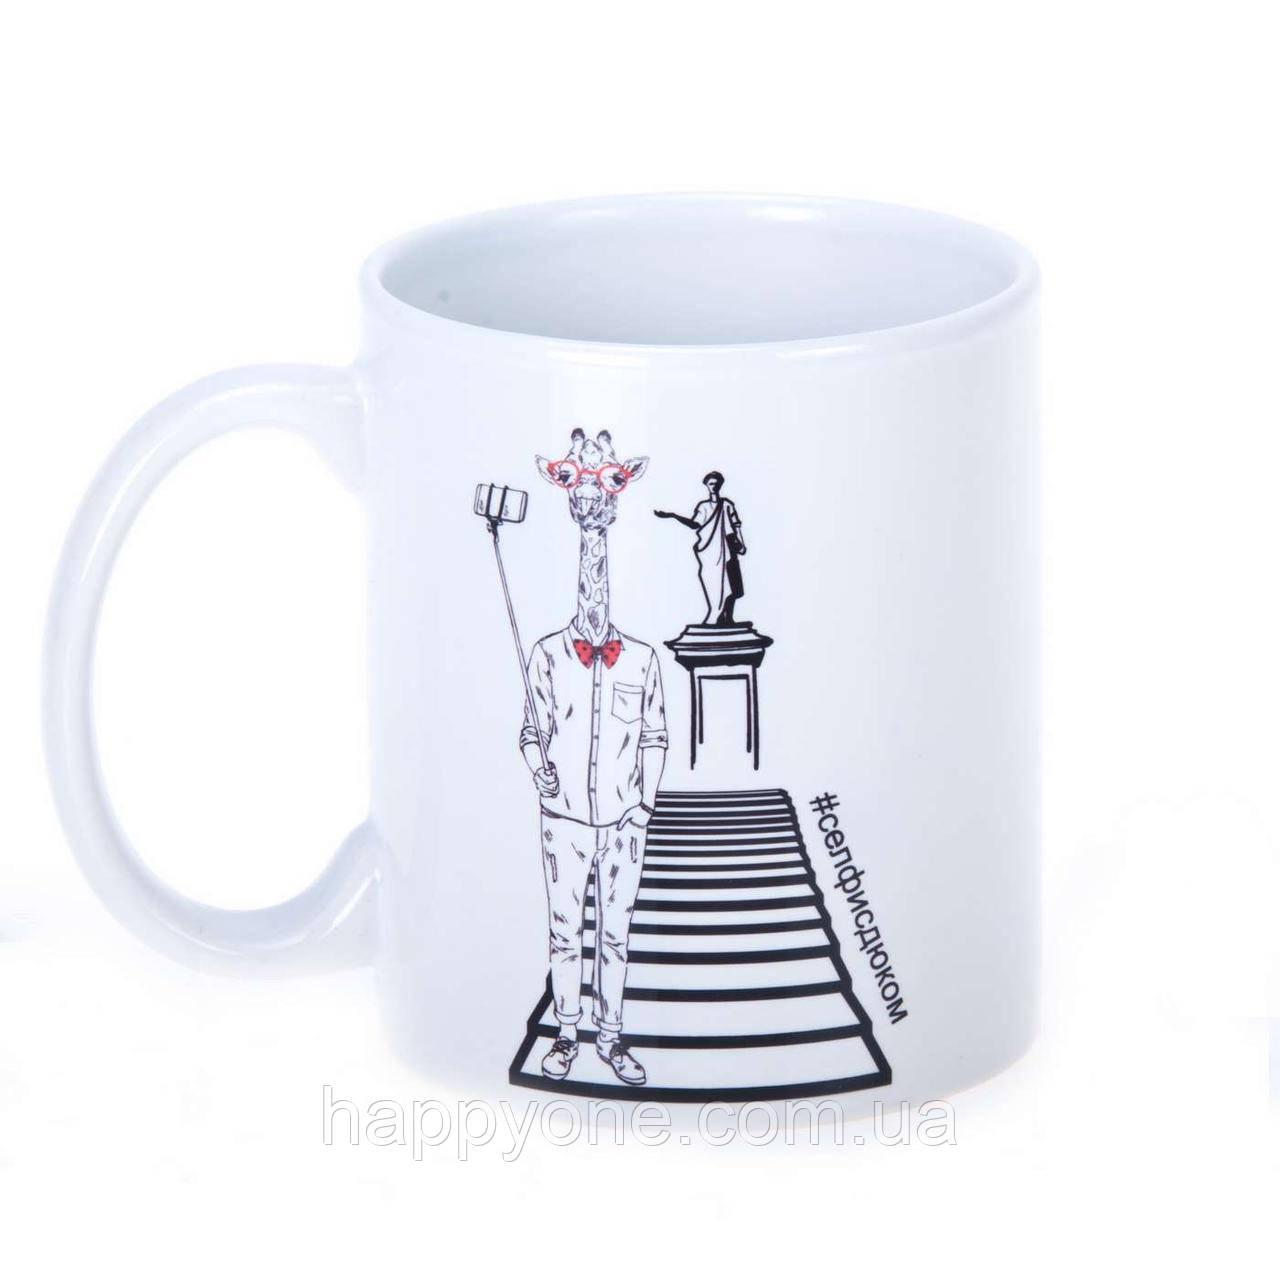 Чашка «Жираф - Селфисдюком» (320 мл)